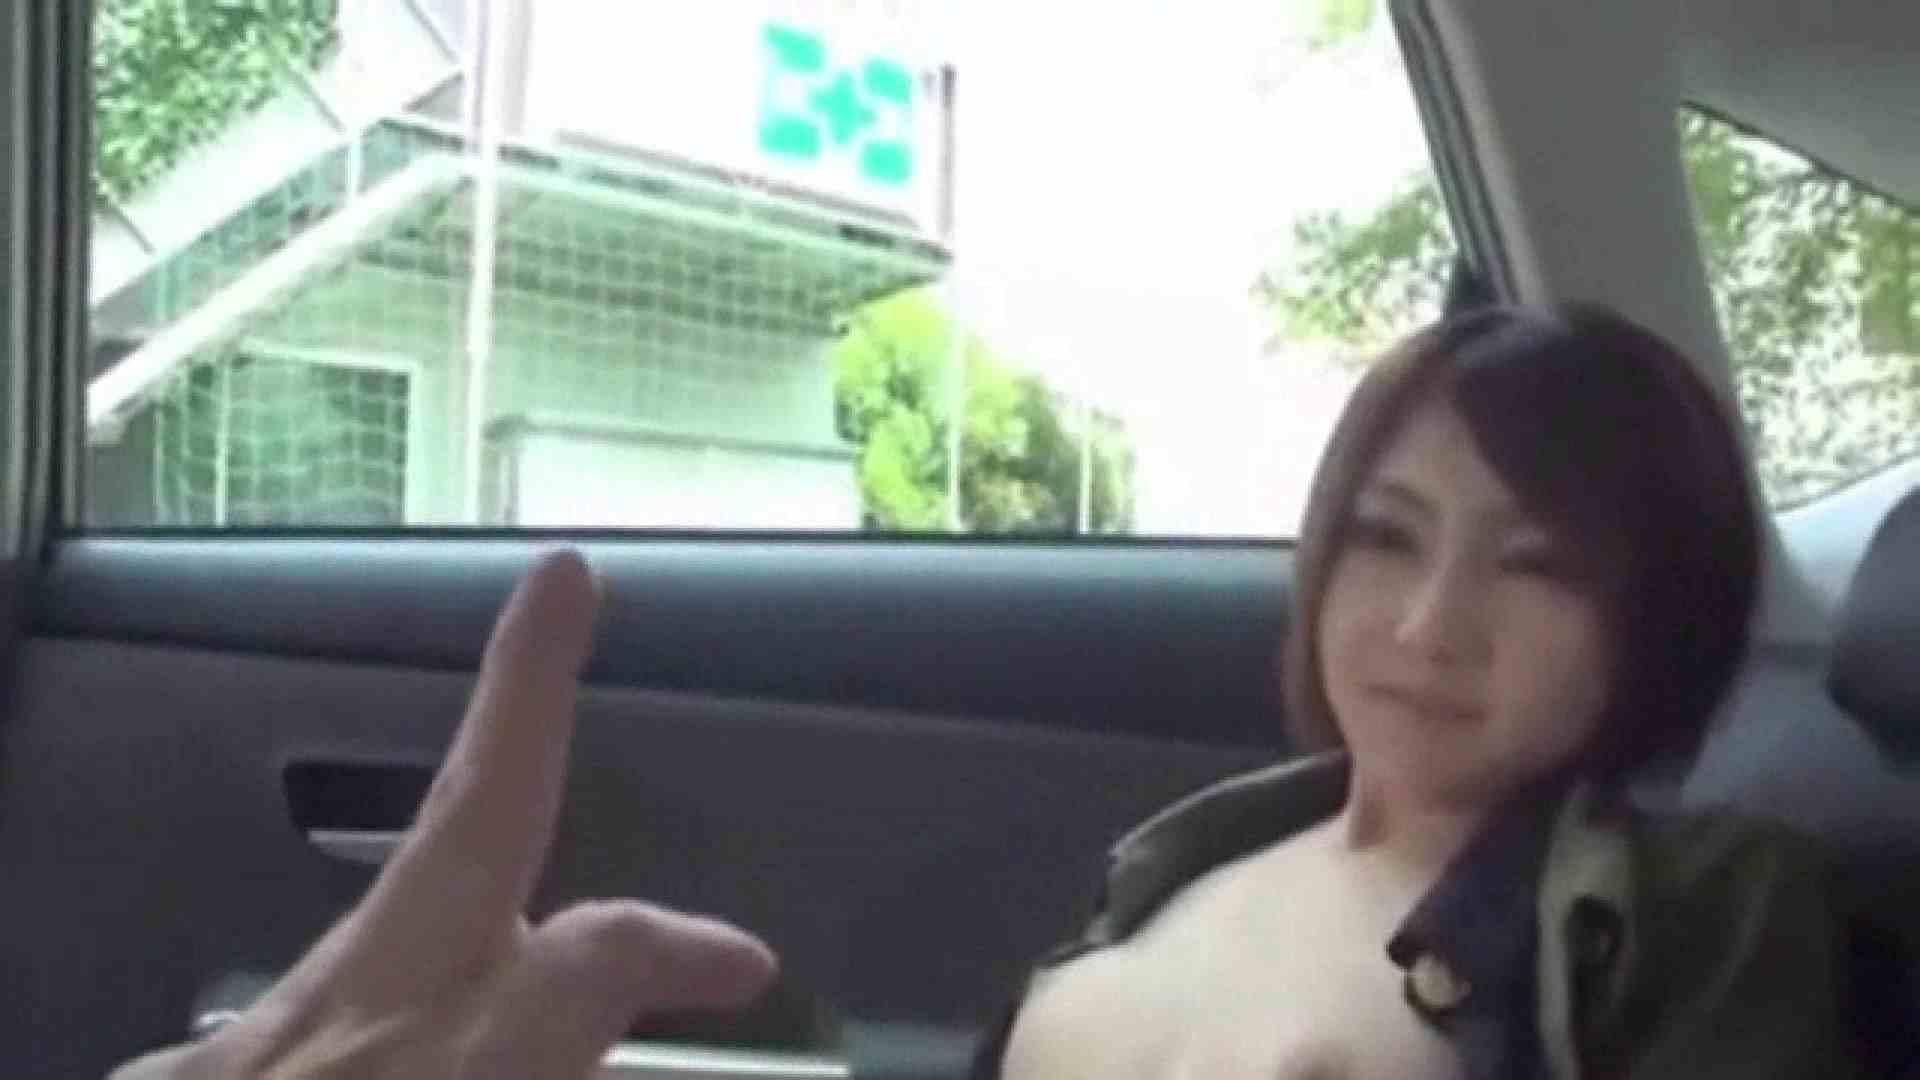 S級厳選美女ビッチガールVol.11 OLセックス  86画像 27